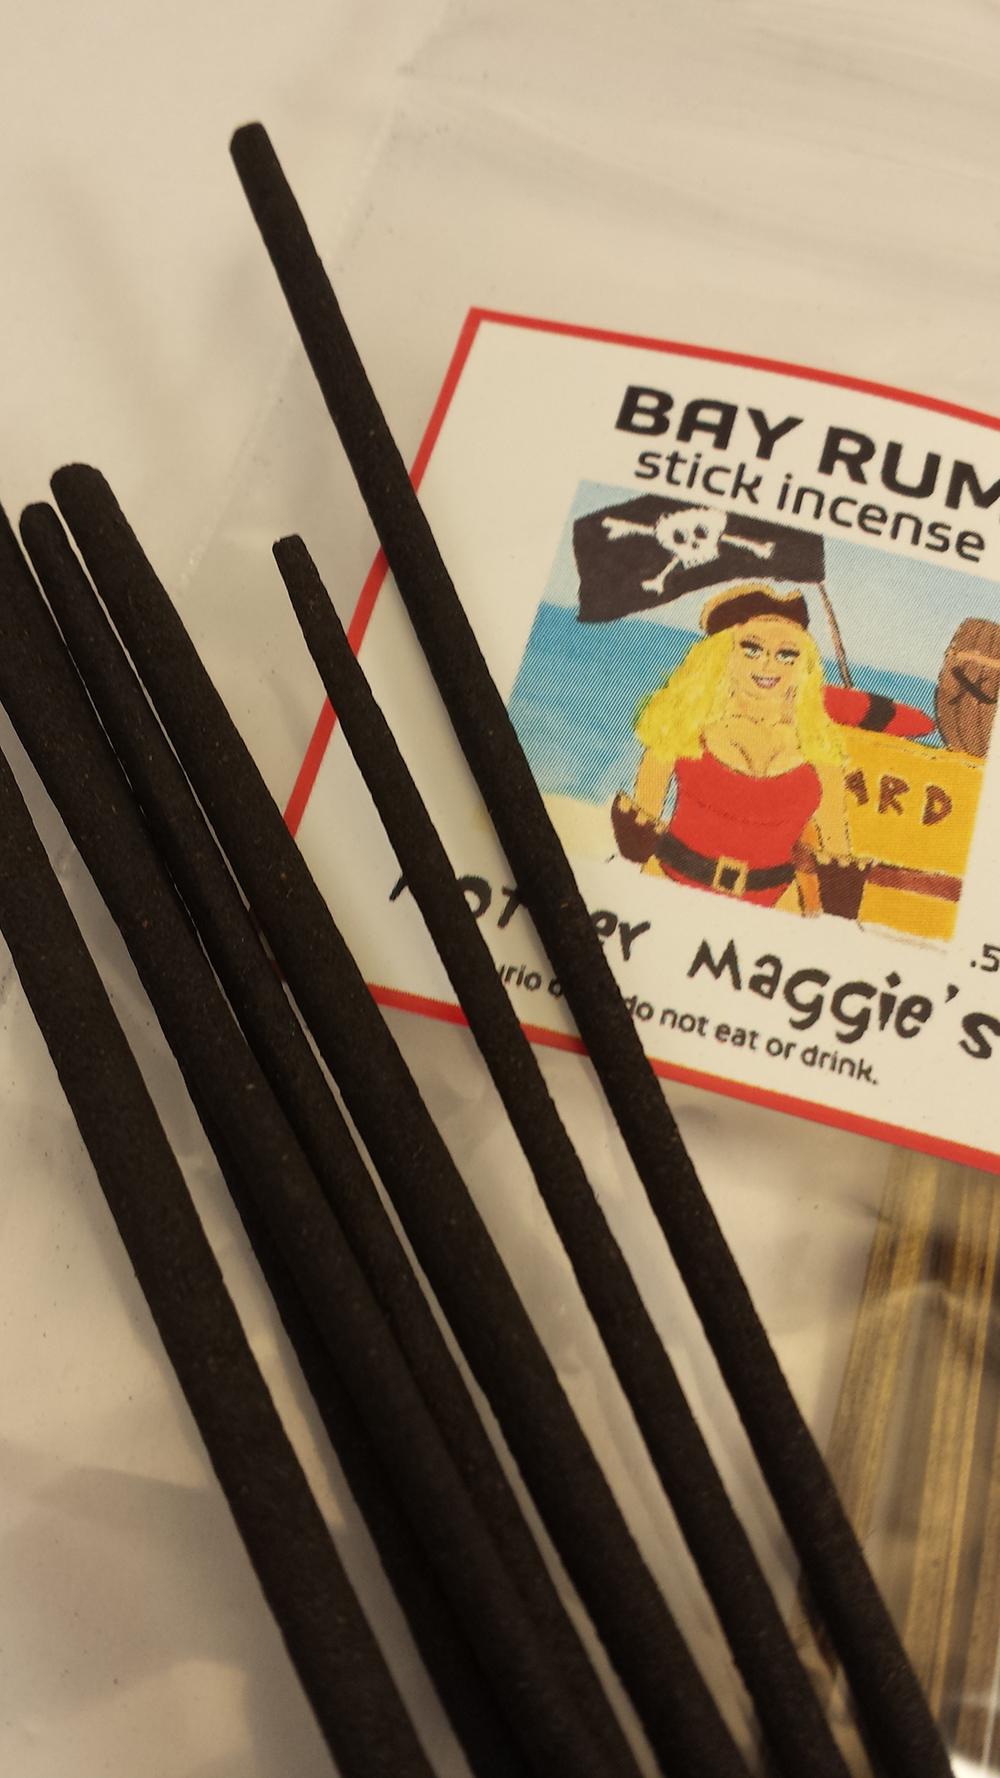 Mother Maggie's Classics 2.0 Stick Incenses